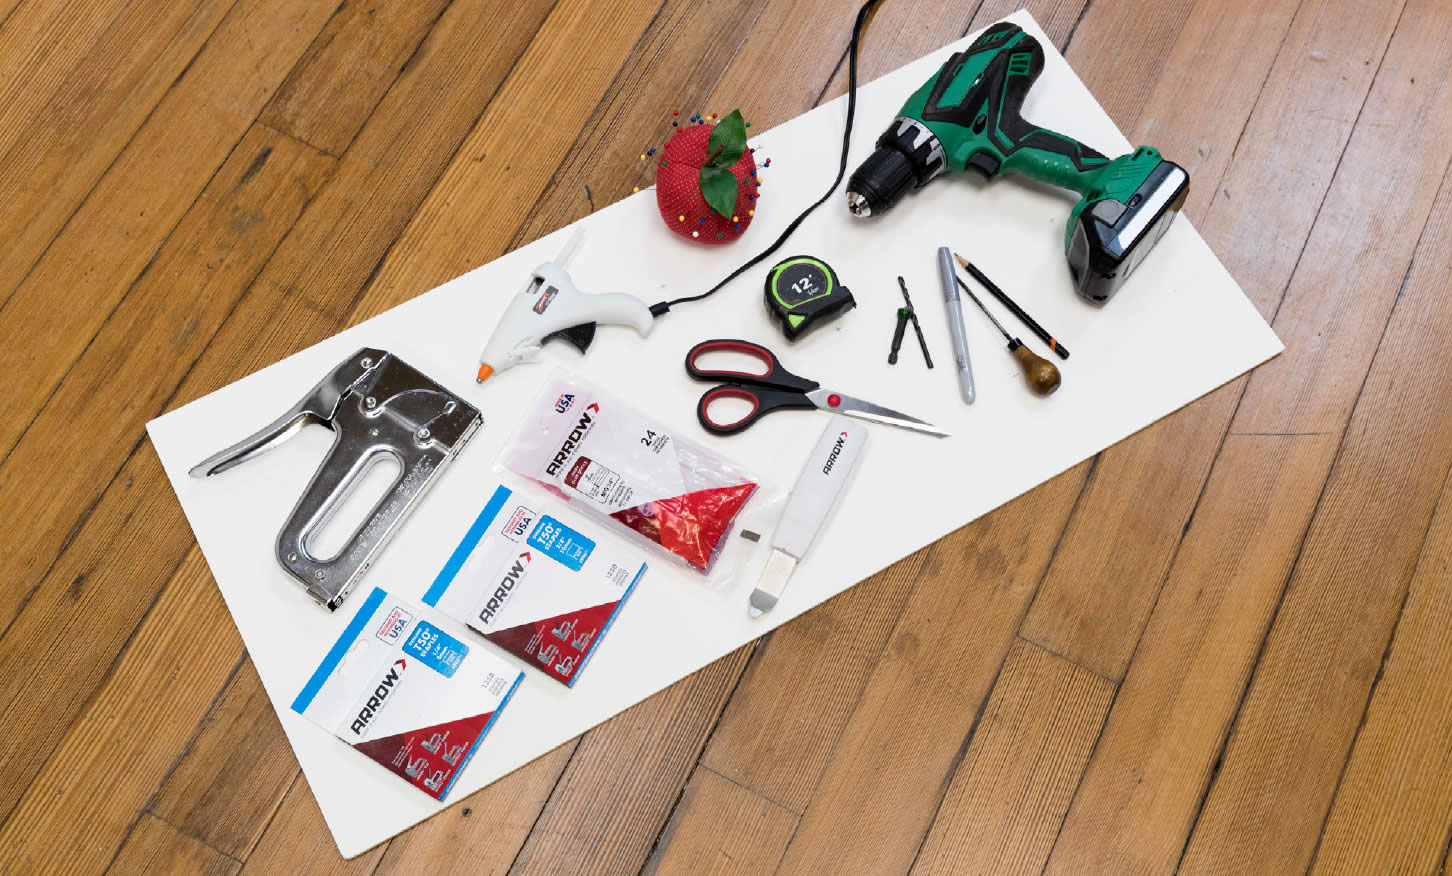 trellis-inspired-headboard-arrow-project-tools